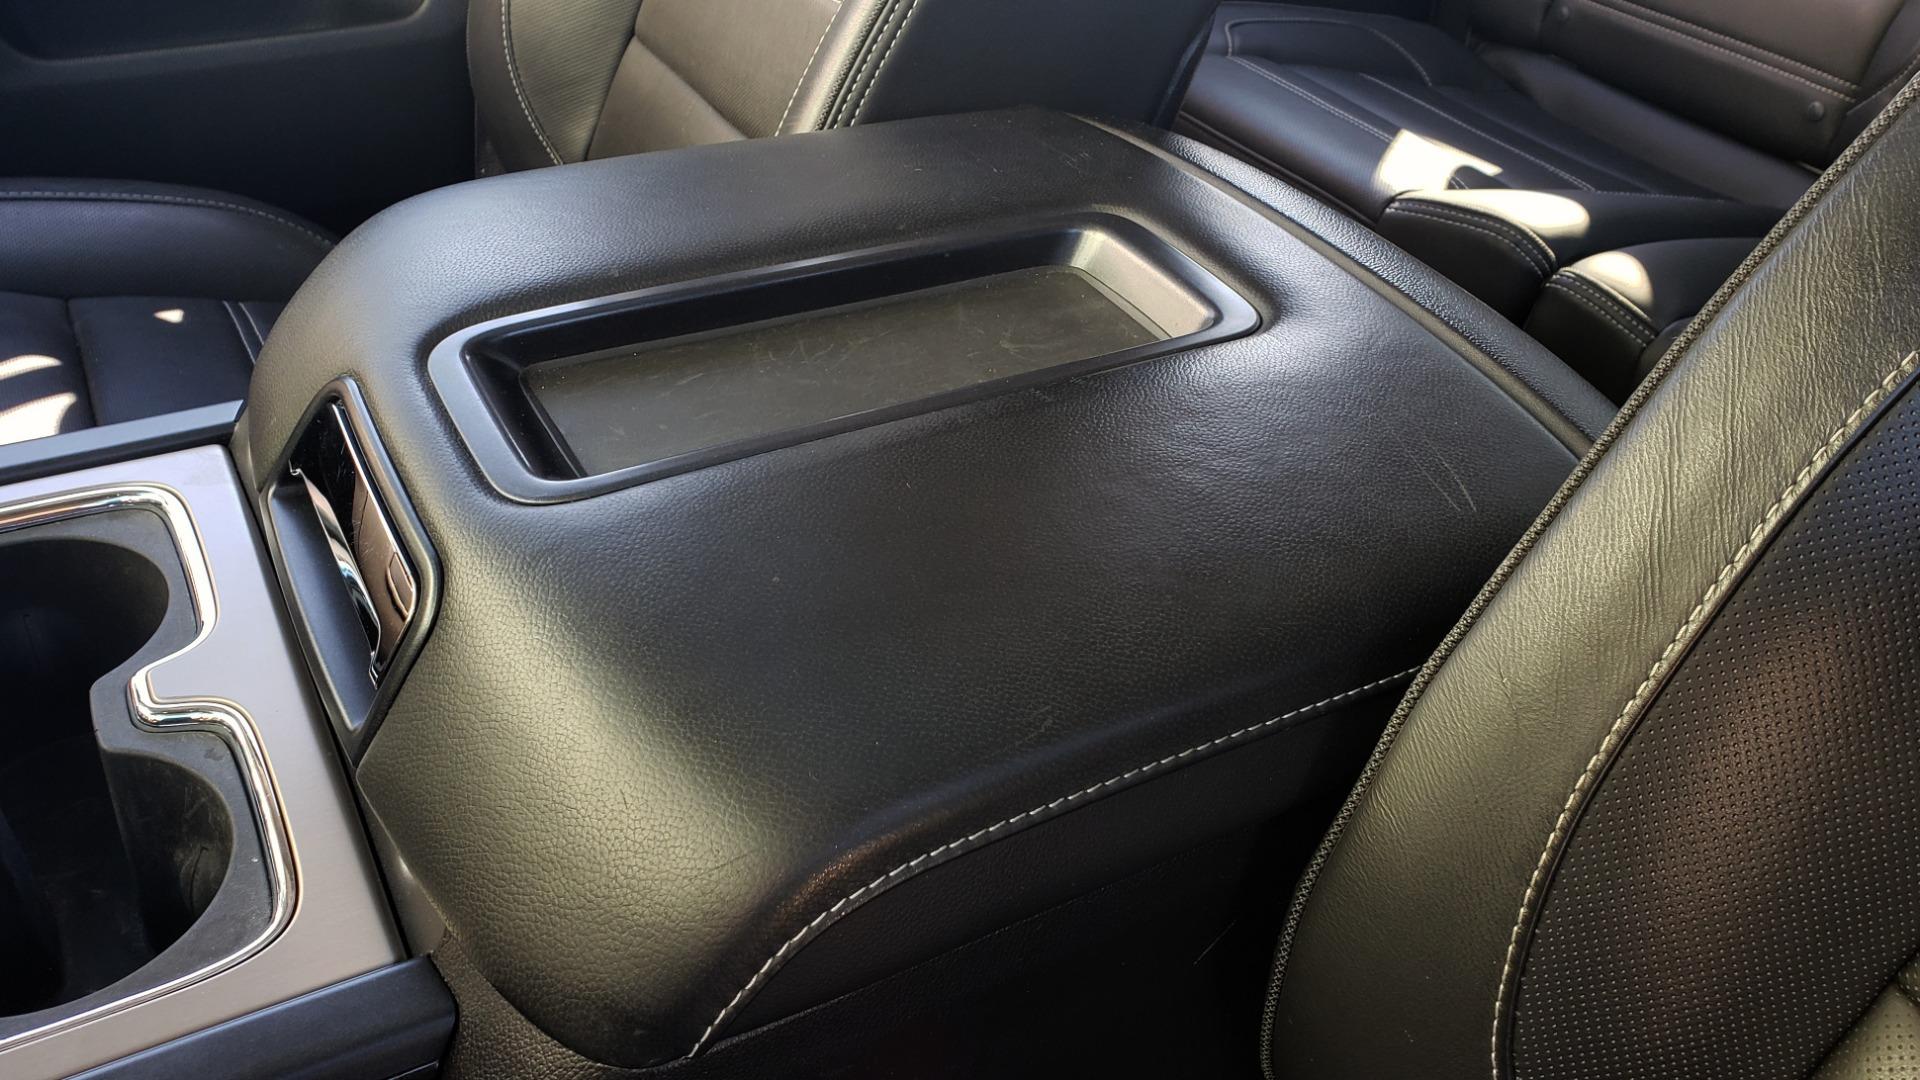 Used 2015 GMC SIERRA 2500HD DENALI 4WD CREWCAB / 6.6L DURAMAX / 6-SPD AUTO / NAV / BOSE for sale $50,995 at Formula Imports in Charlotte NC 28227 42